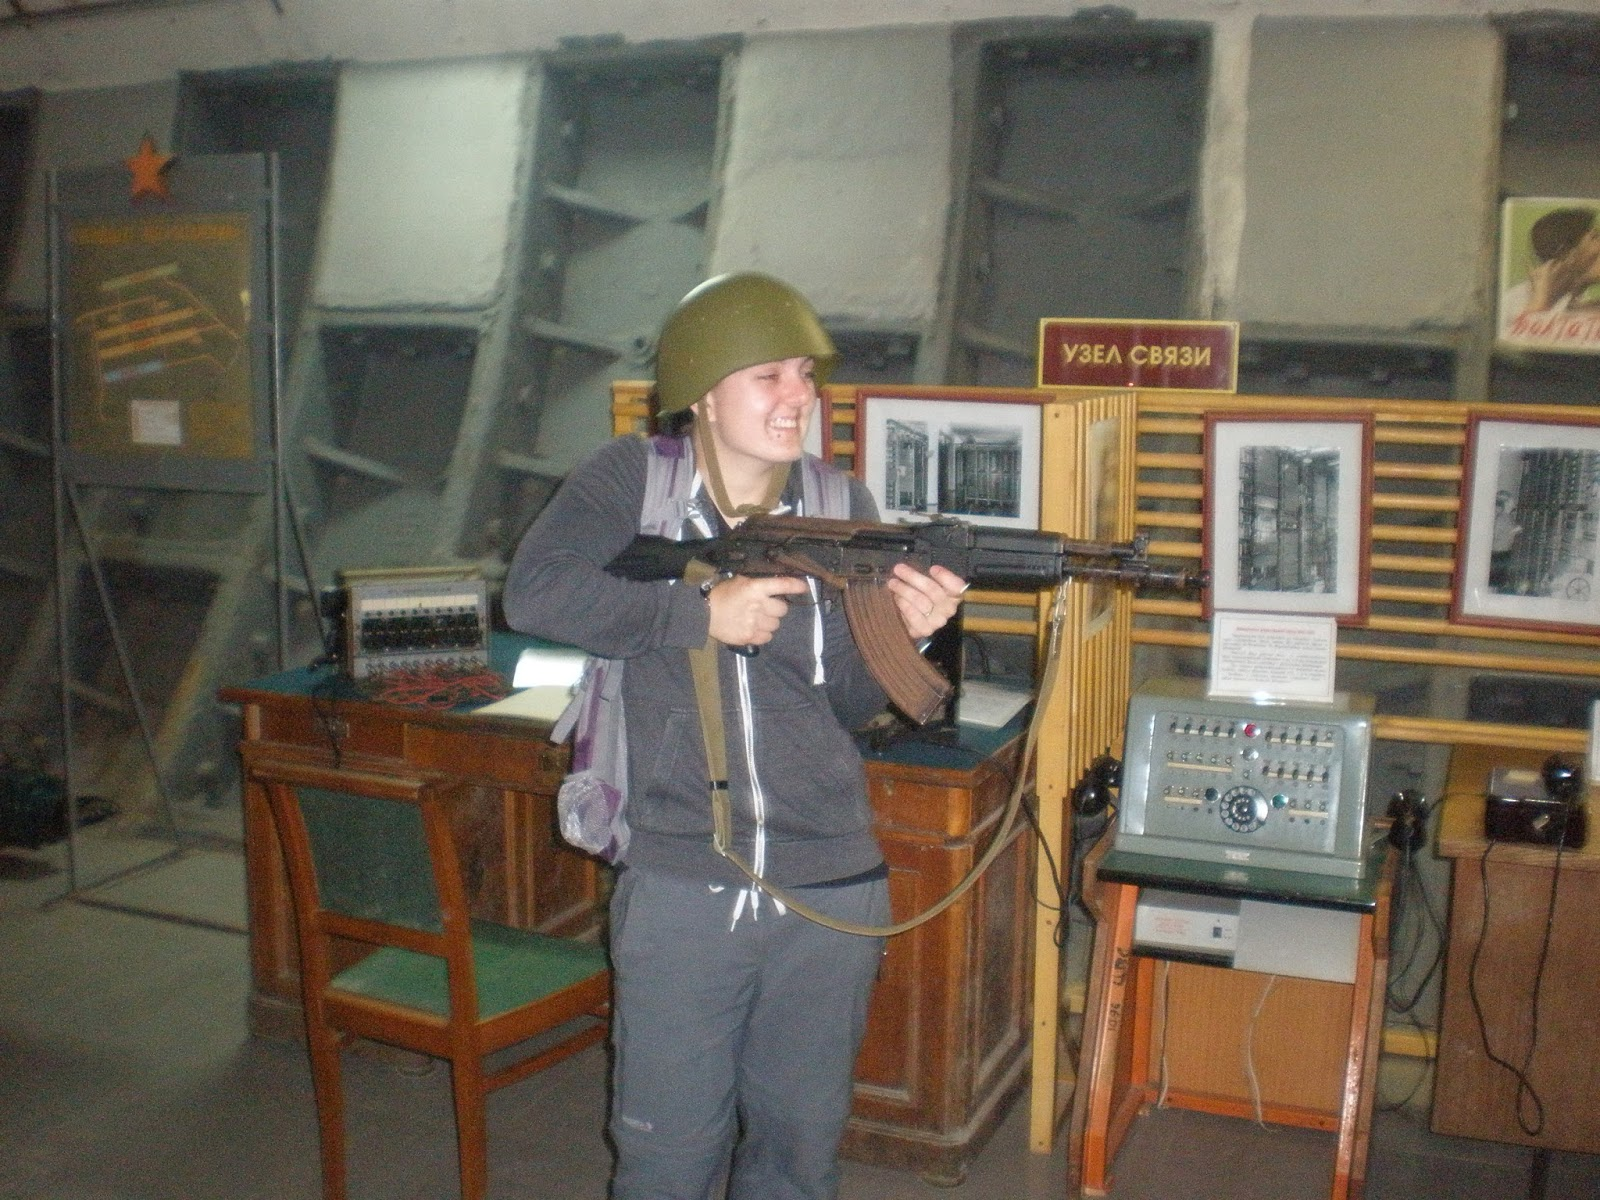 Moscow, AK47, Shooting range, pistol, Ruger Mk III, GLOCK 17, Revolvers, Ceska Zbrojovka, Grand Taurus 86, Rifles, Kalashnikov (AK-47), Remington 870, Shotgun, Weapons, Dragunov, (SVD), Sniper Rifle, celeritas shooting club, eastern europe, hungary, budapest, bucket list, travel, travelling, traveling, experiences, gun, shooting, adventure, travel blog,